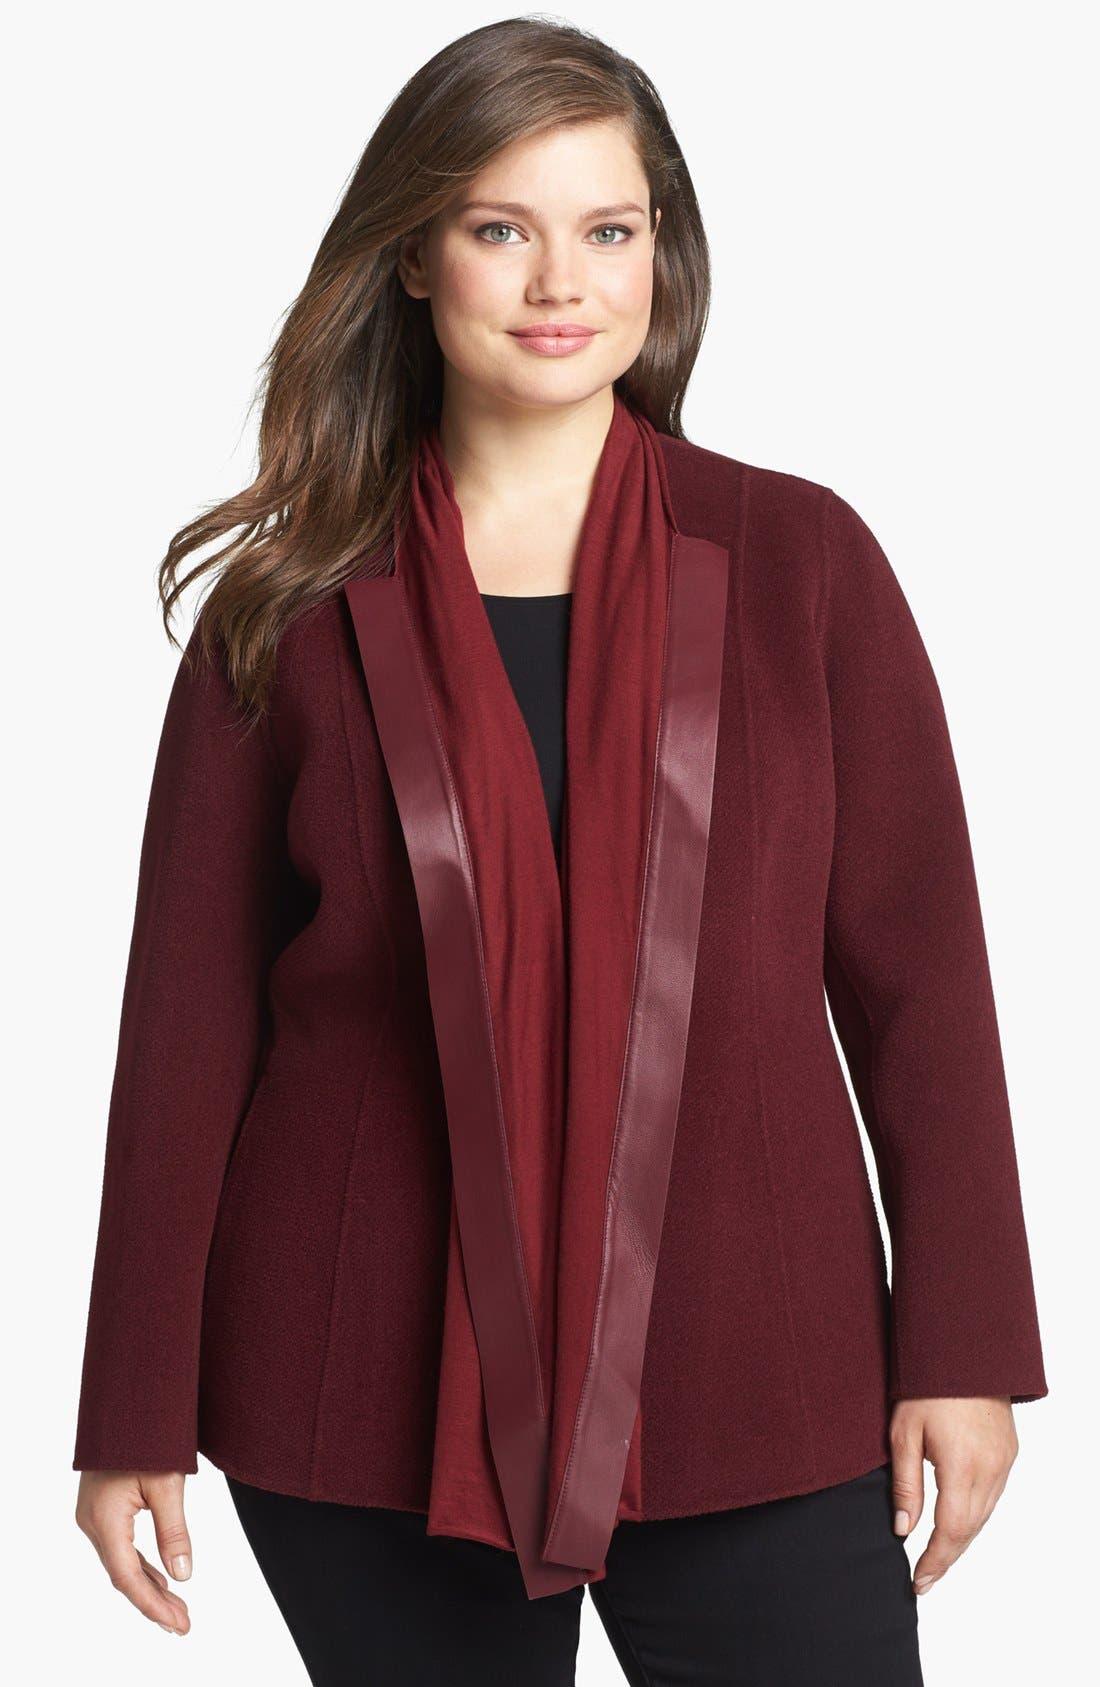 Alternate Image 1 Selected - Lafayette 148 New York 'Alessa' Leather Trim Wool & Angora Jacket (Plus Size)